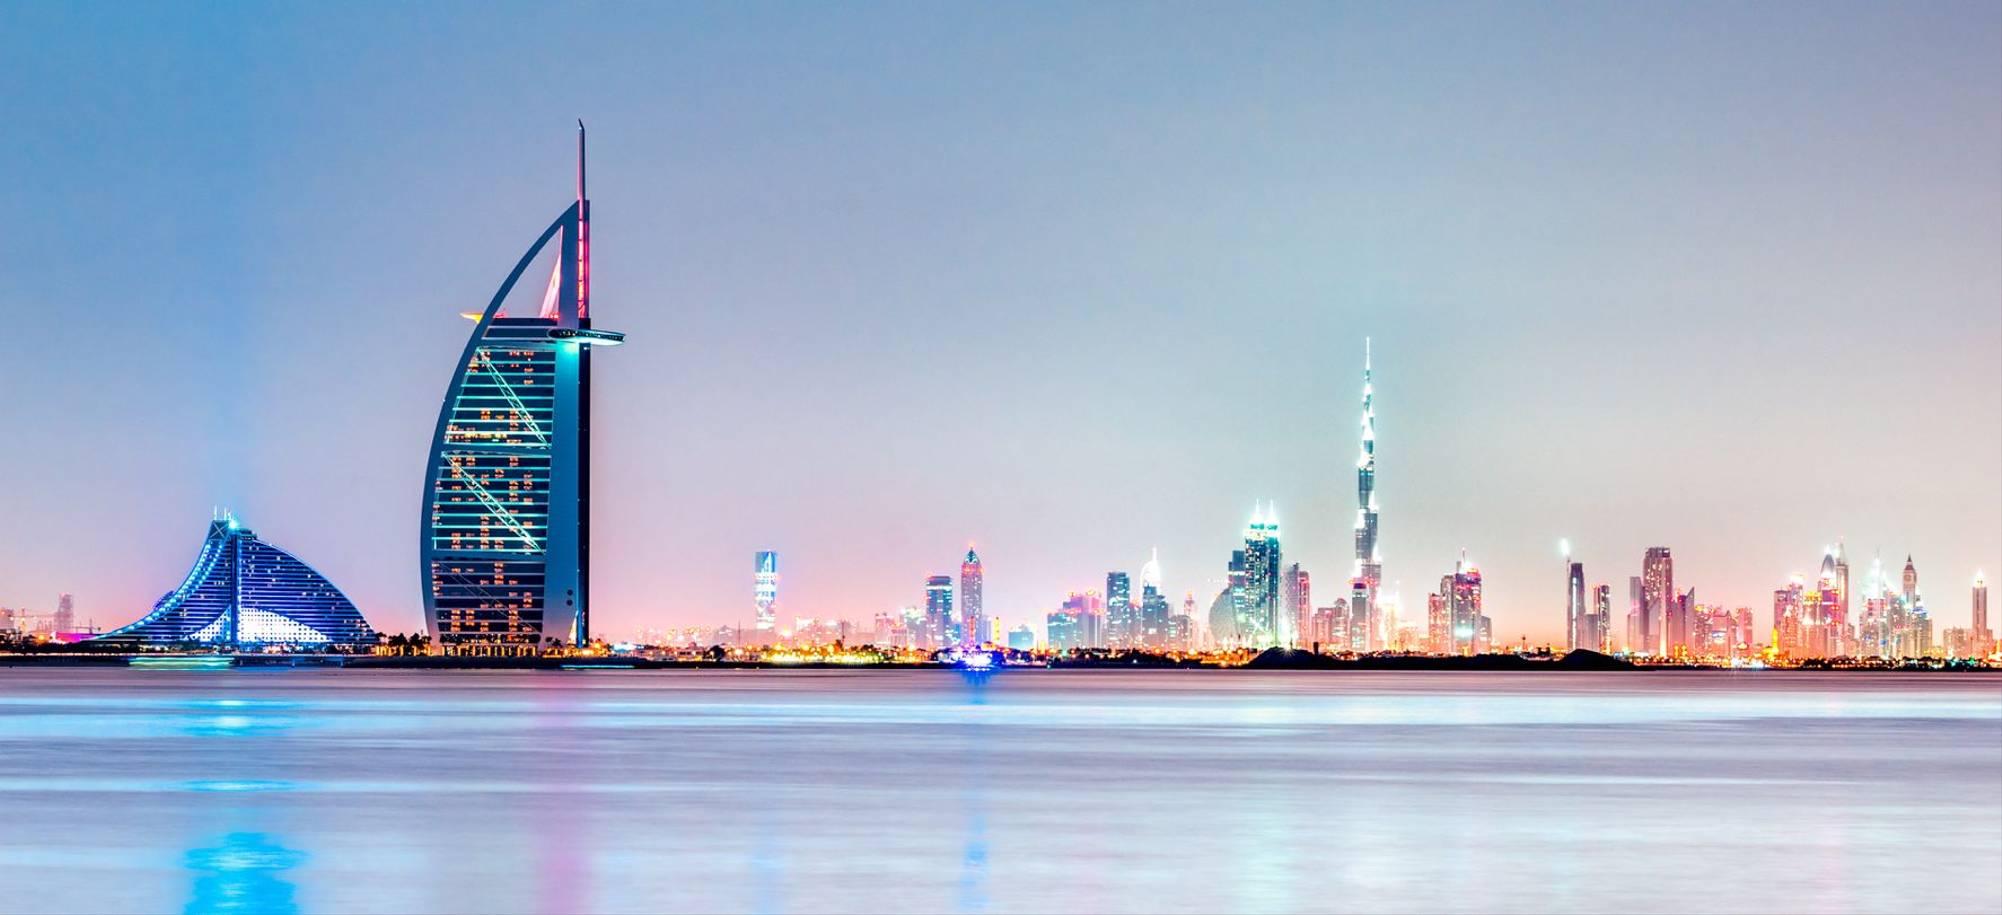 Dubai   Burj Al Arab   Itinerary Desktop